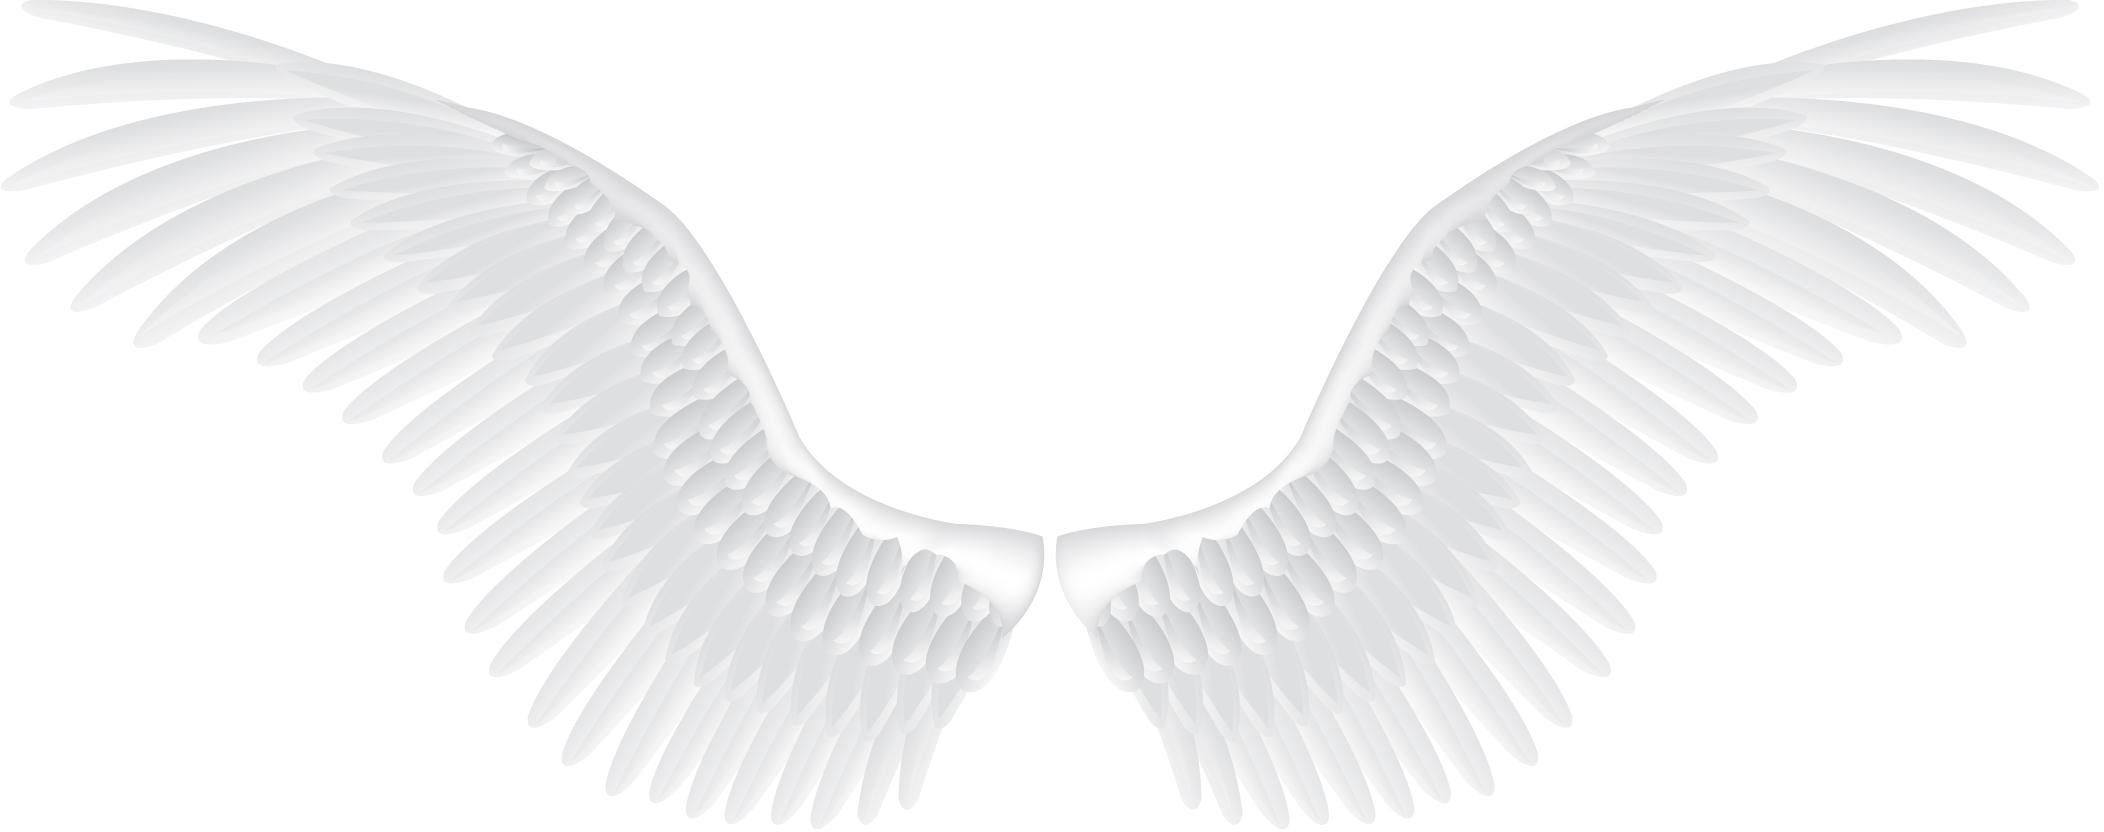 White Wings Png Image Wings Png White Wings Wings